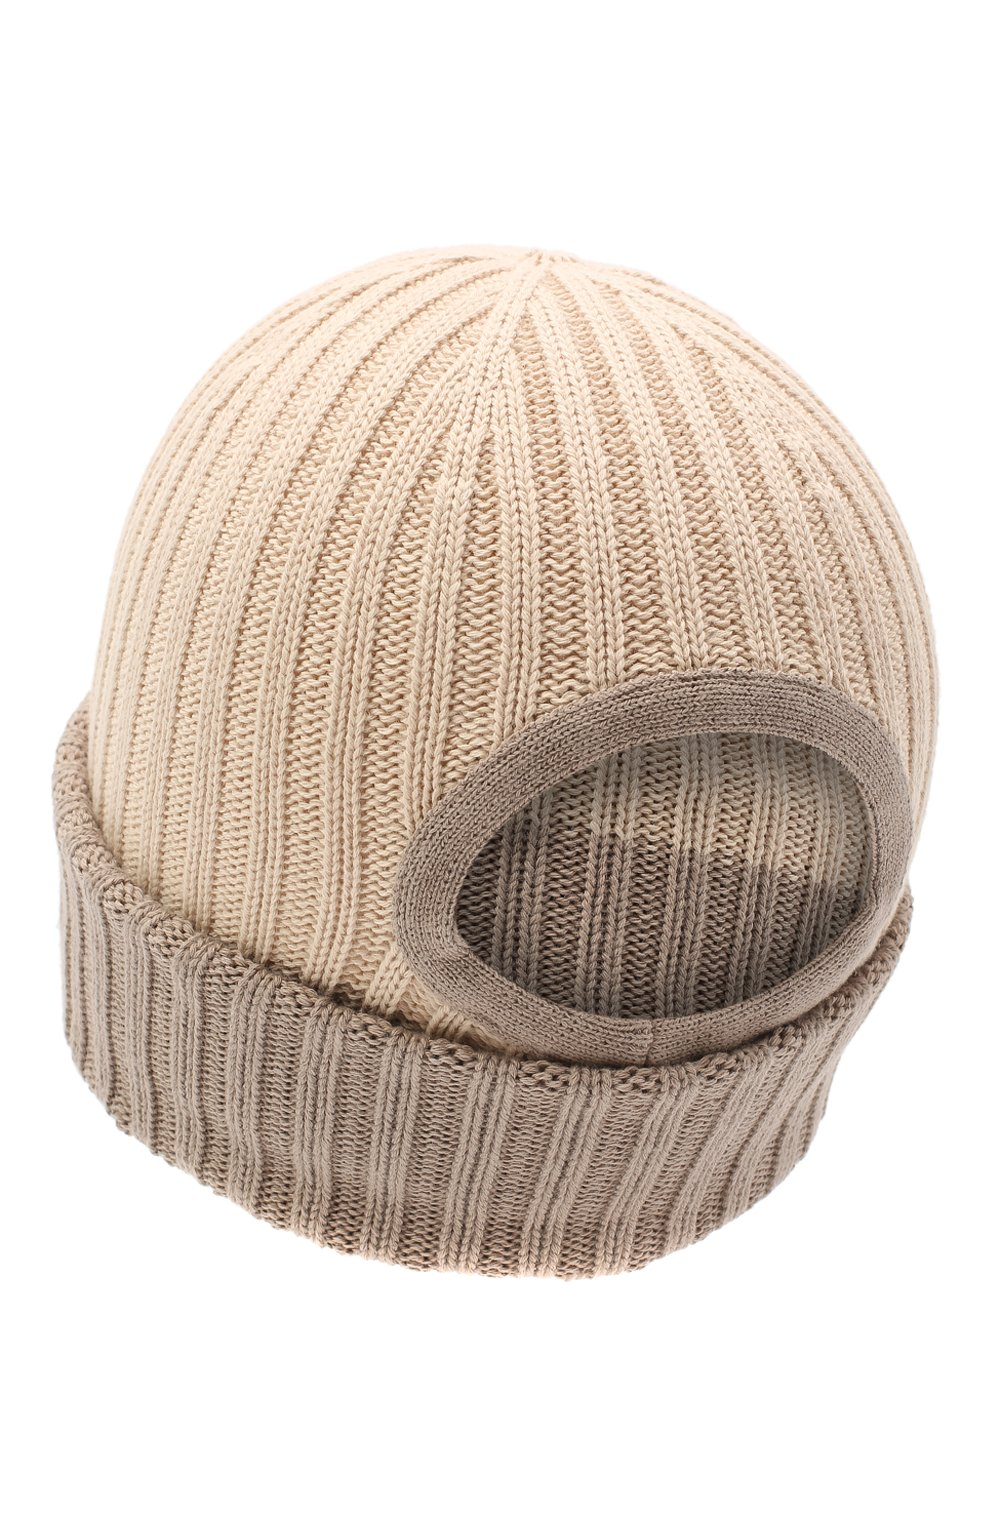 Мужская хлопковая шапка le bonnet JACQUEMUS бежевого цвета, арт. 206AC07/514160   Фото 2